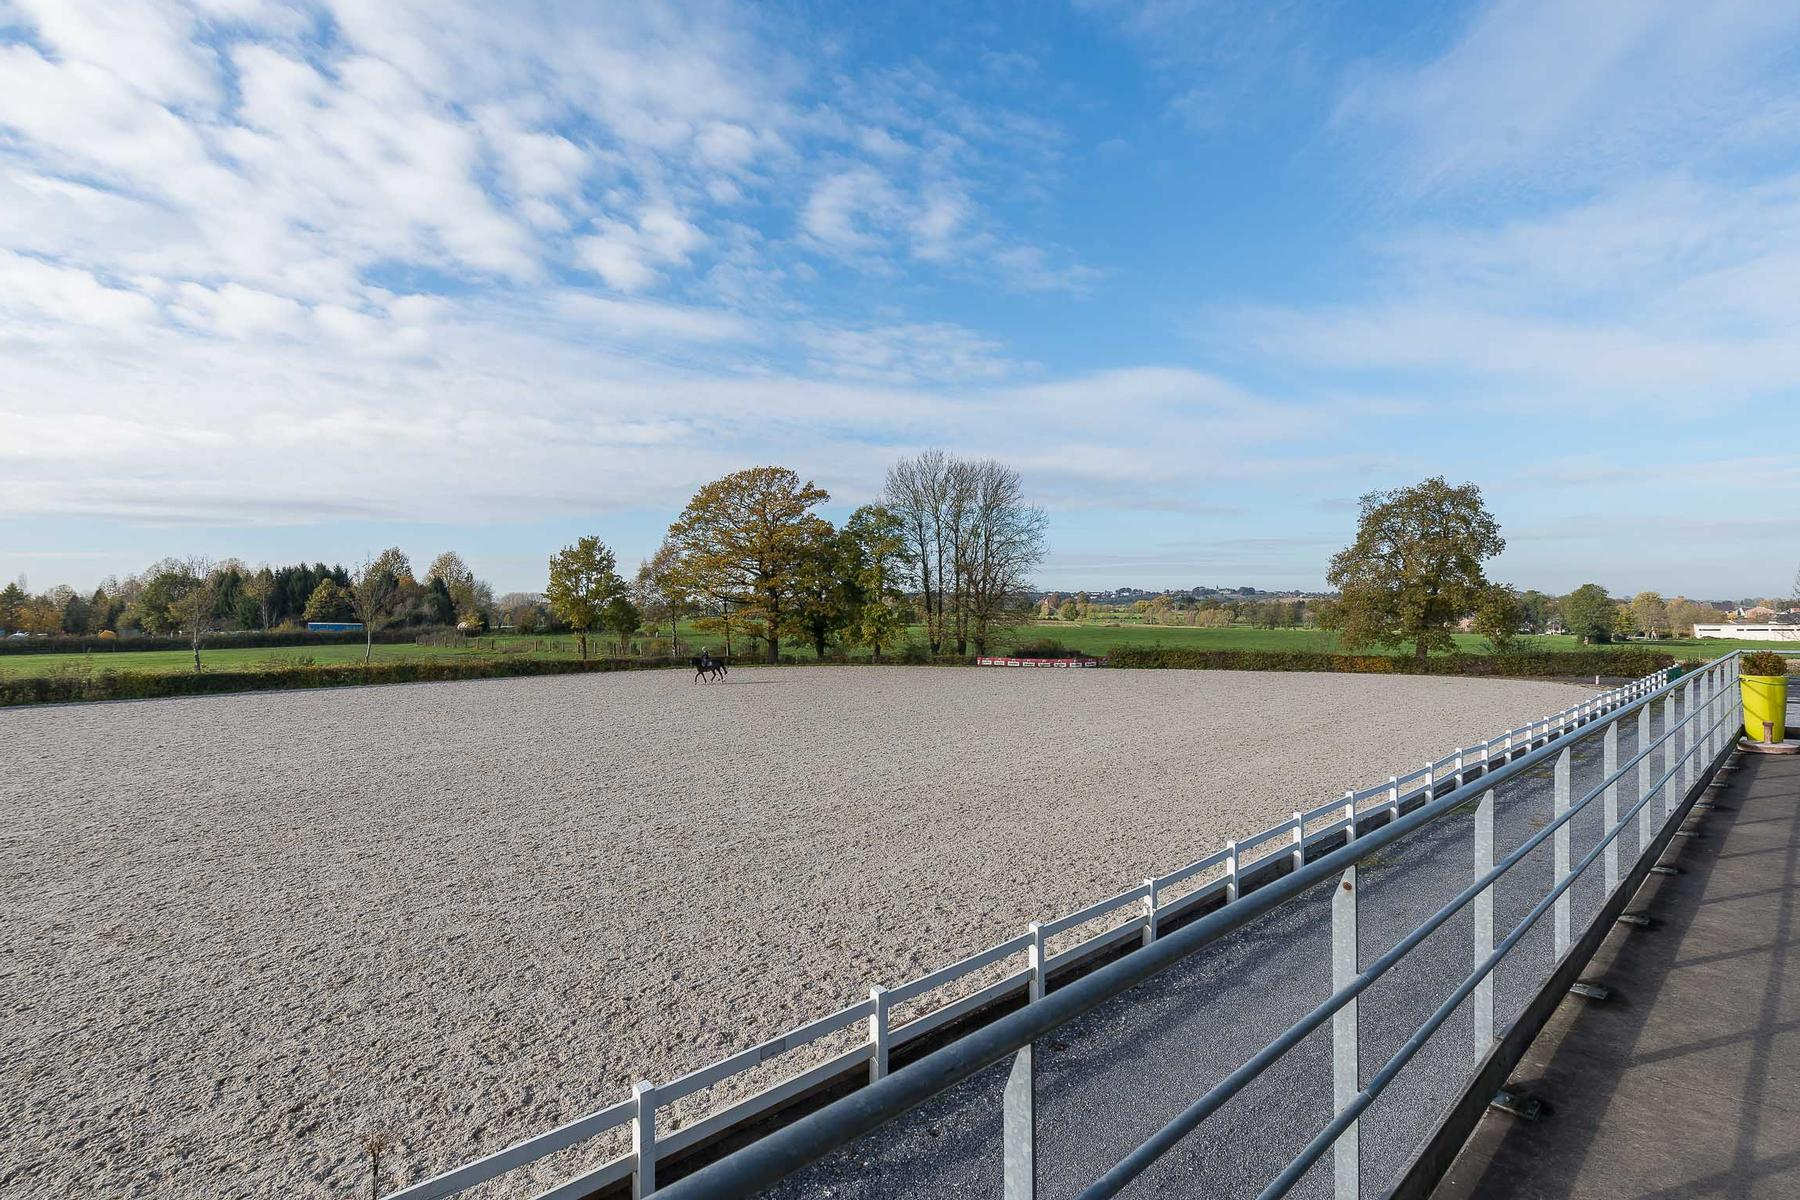 Farm / Ranch / Plantation for Sale at Liège I Welkenraedt Other Liege, Liege, 4840 Belgium